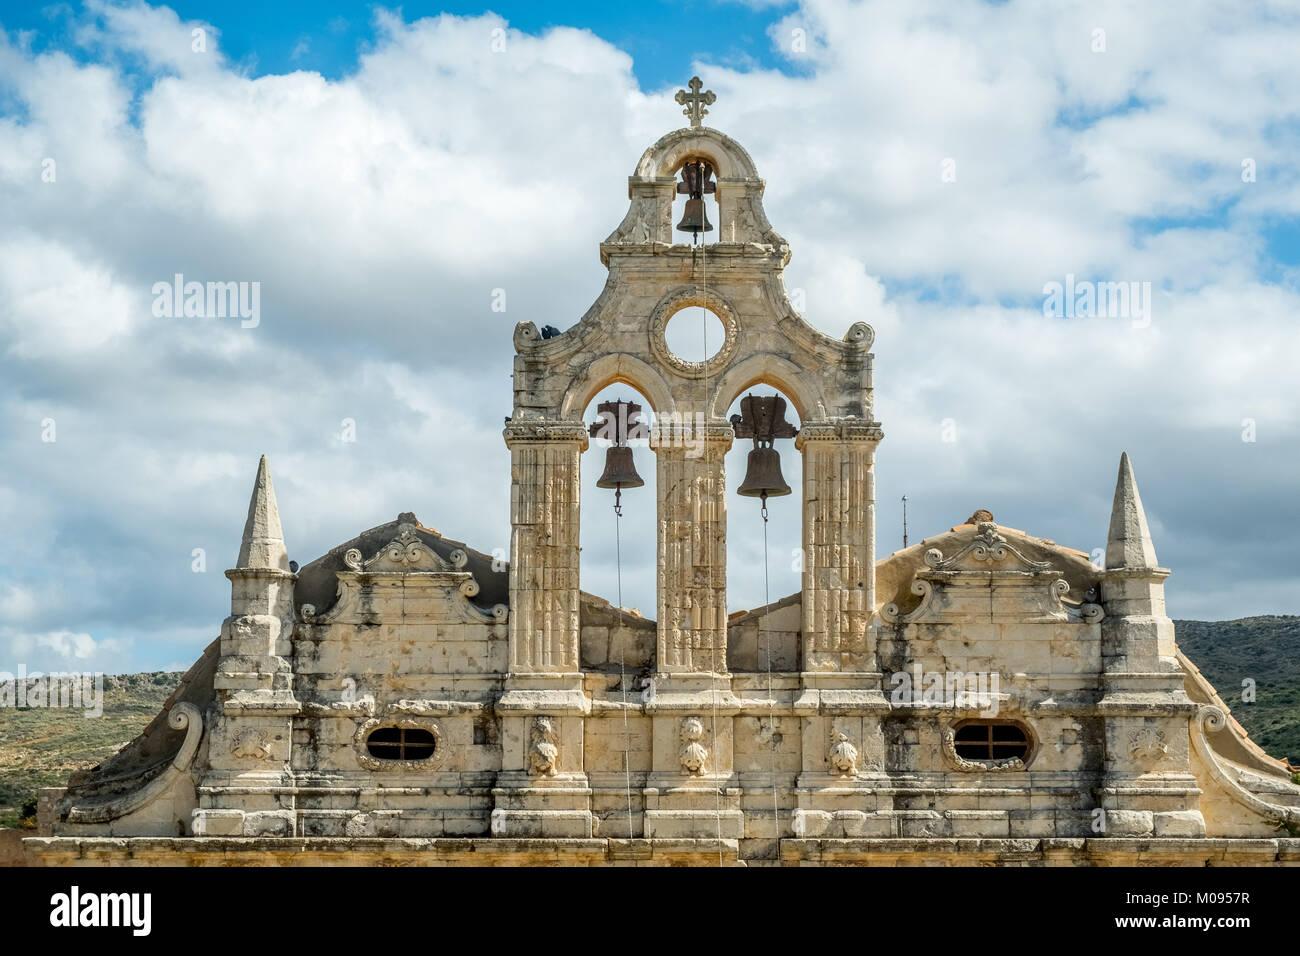 Bell tower of the two-nave monastery church Moni Arkadi Monastery, Greek Orthodox Church, National Monument of Crete - Stock Image